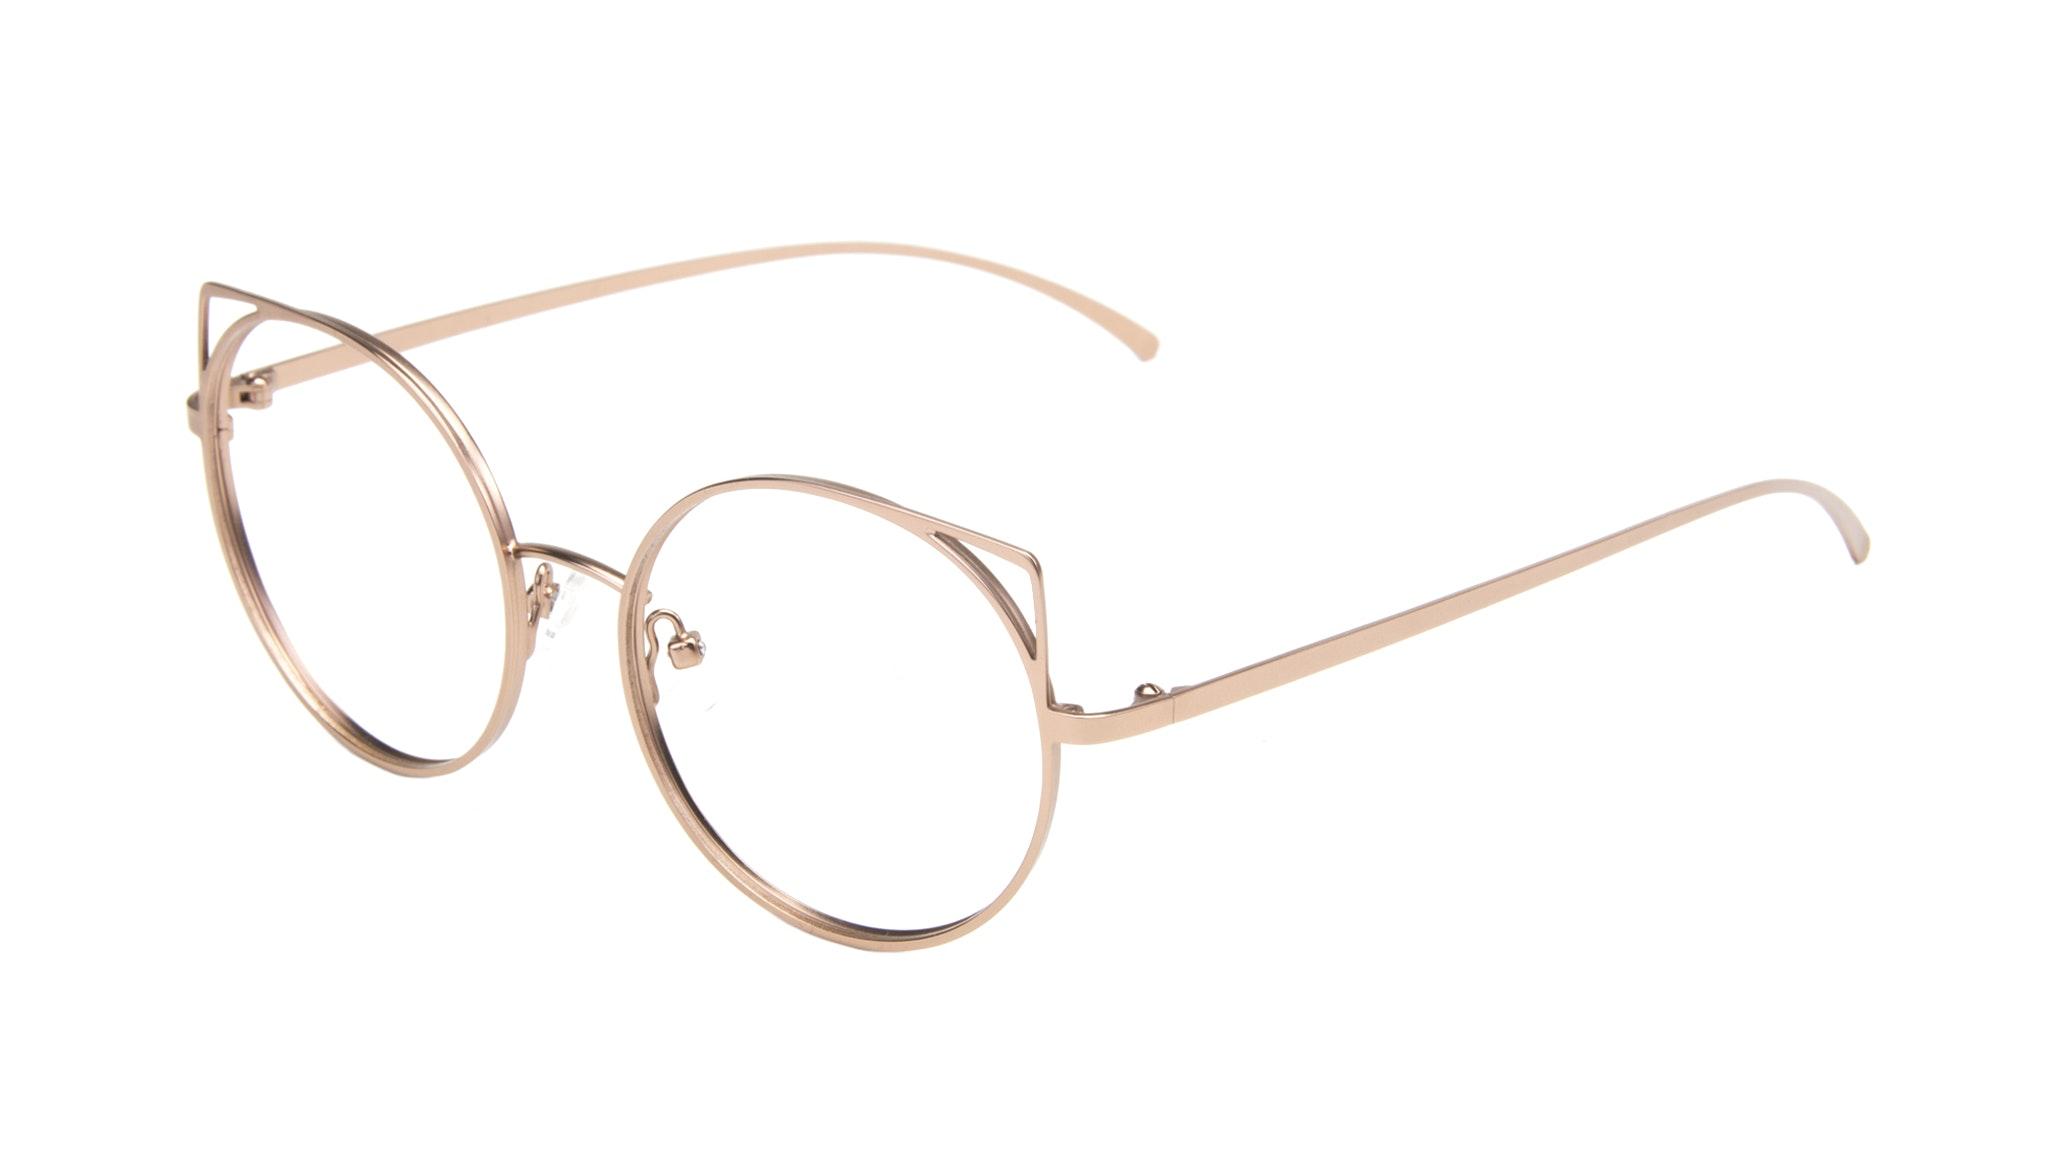 Affordable Fashion Glasses Cat Eye Round Eyeglasses Women Lolly Baby Britain Tilt